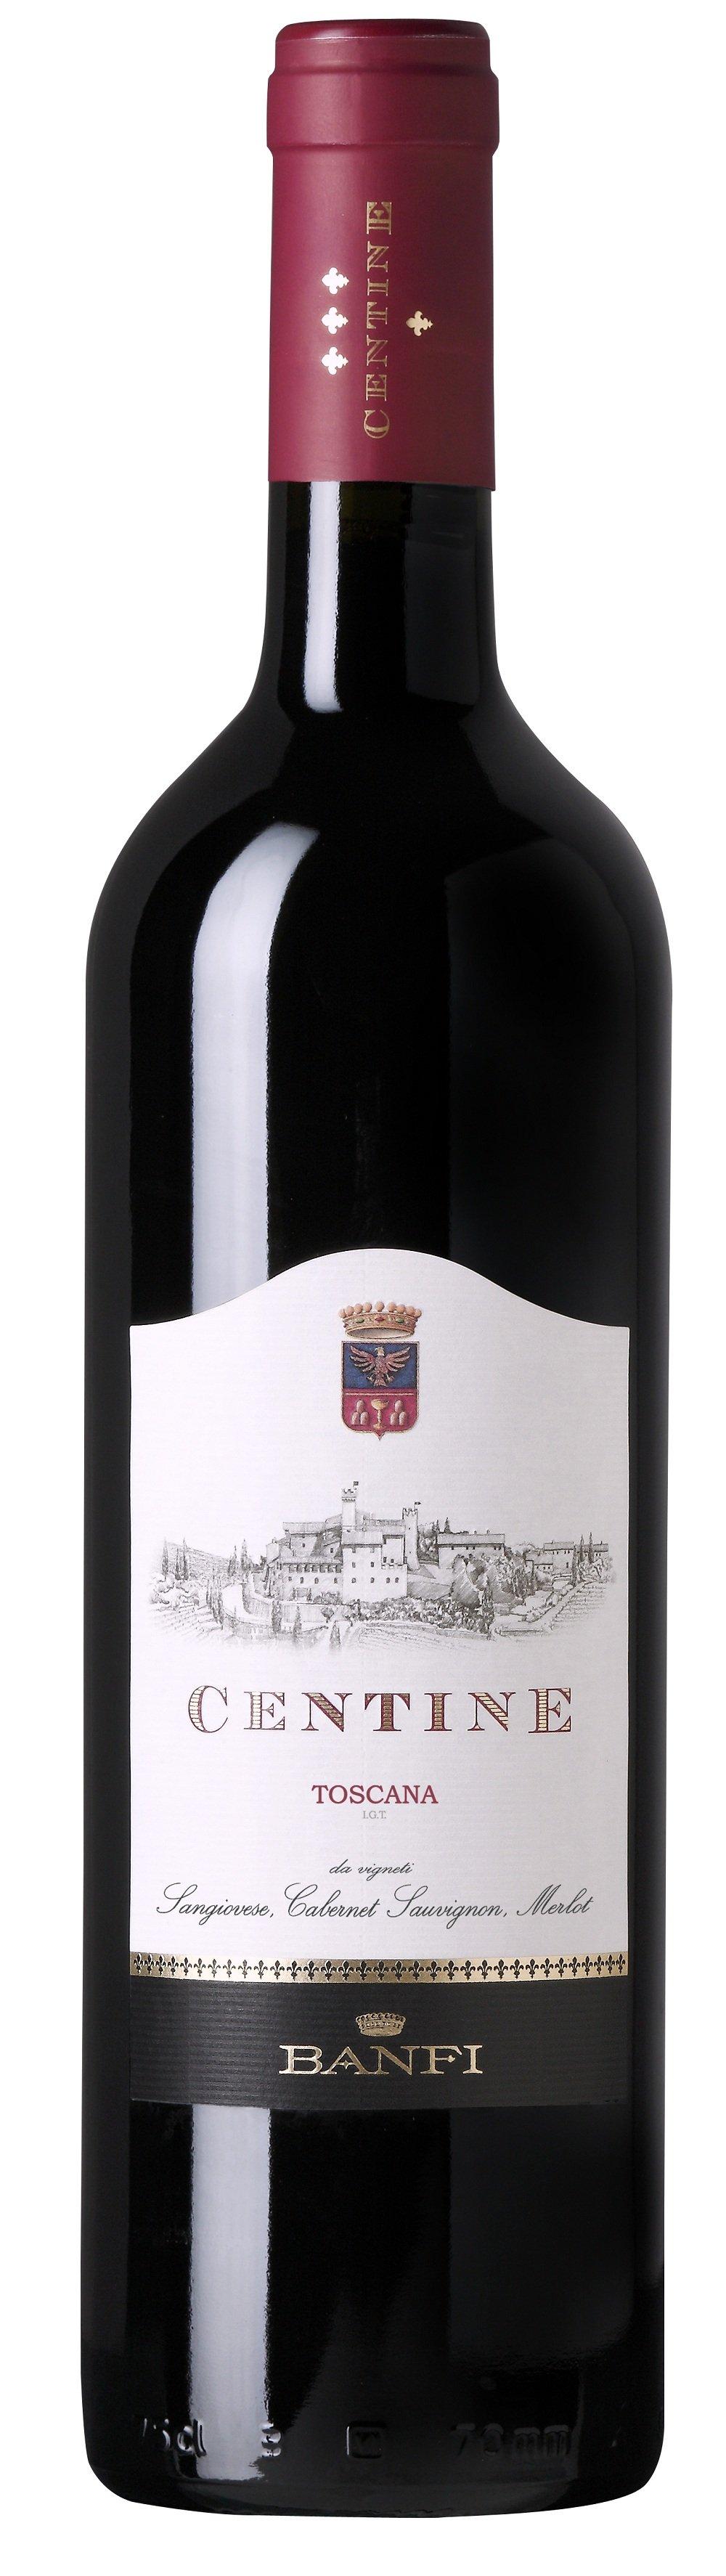 2010 Banfi Centine Toscana Bianco White Wine